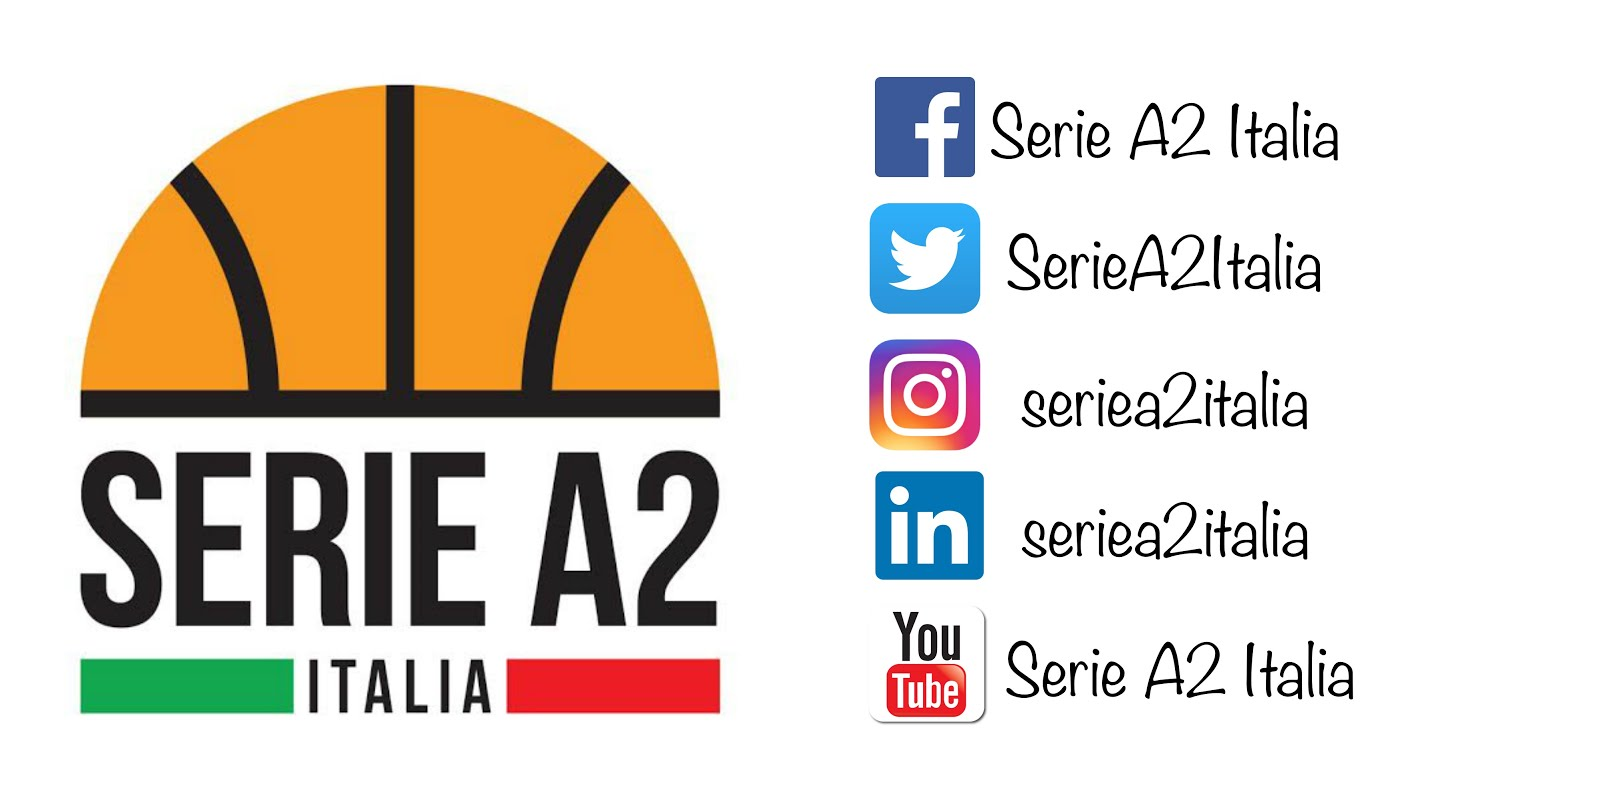 SerieA2Italia: SERIE A2 ITALIA IN PILLOLE, MARTEDÌ 4 LUGLIO.